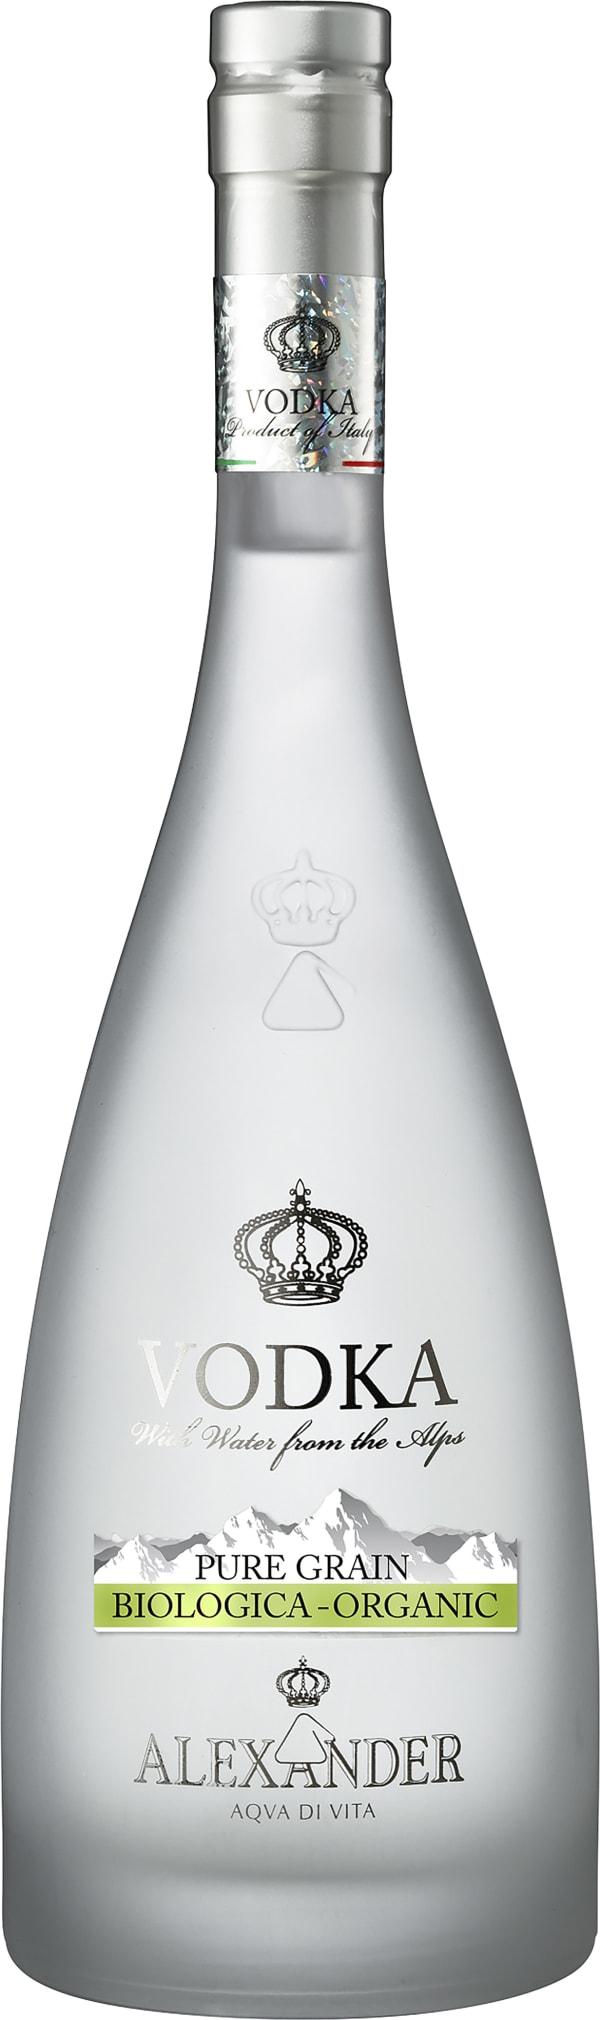 Alexander Organic Vodka